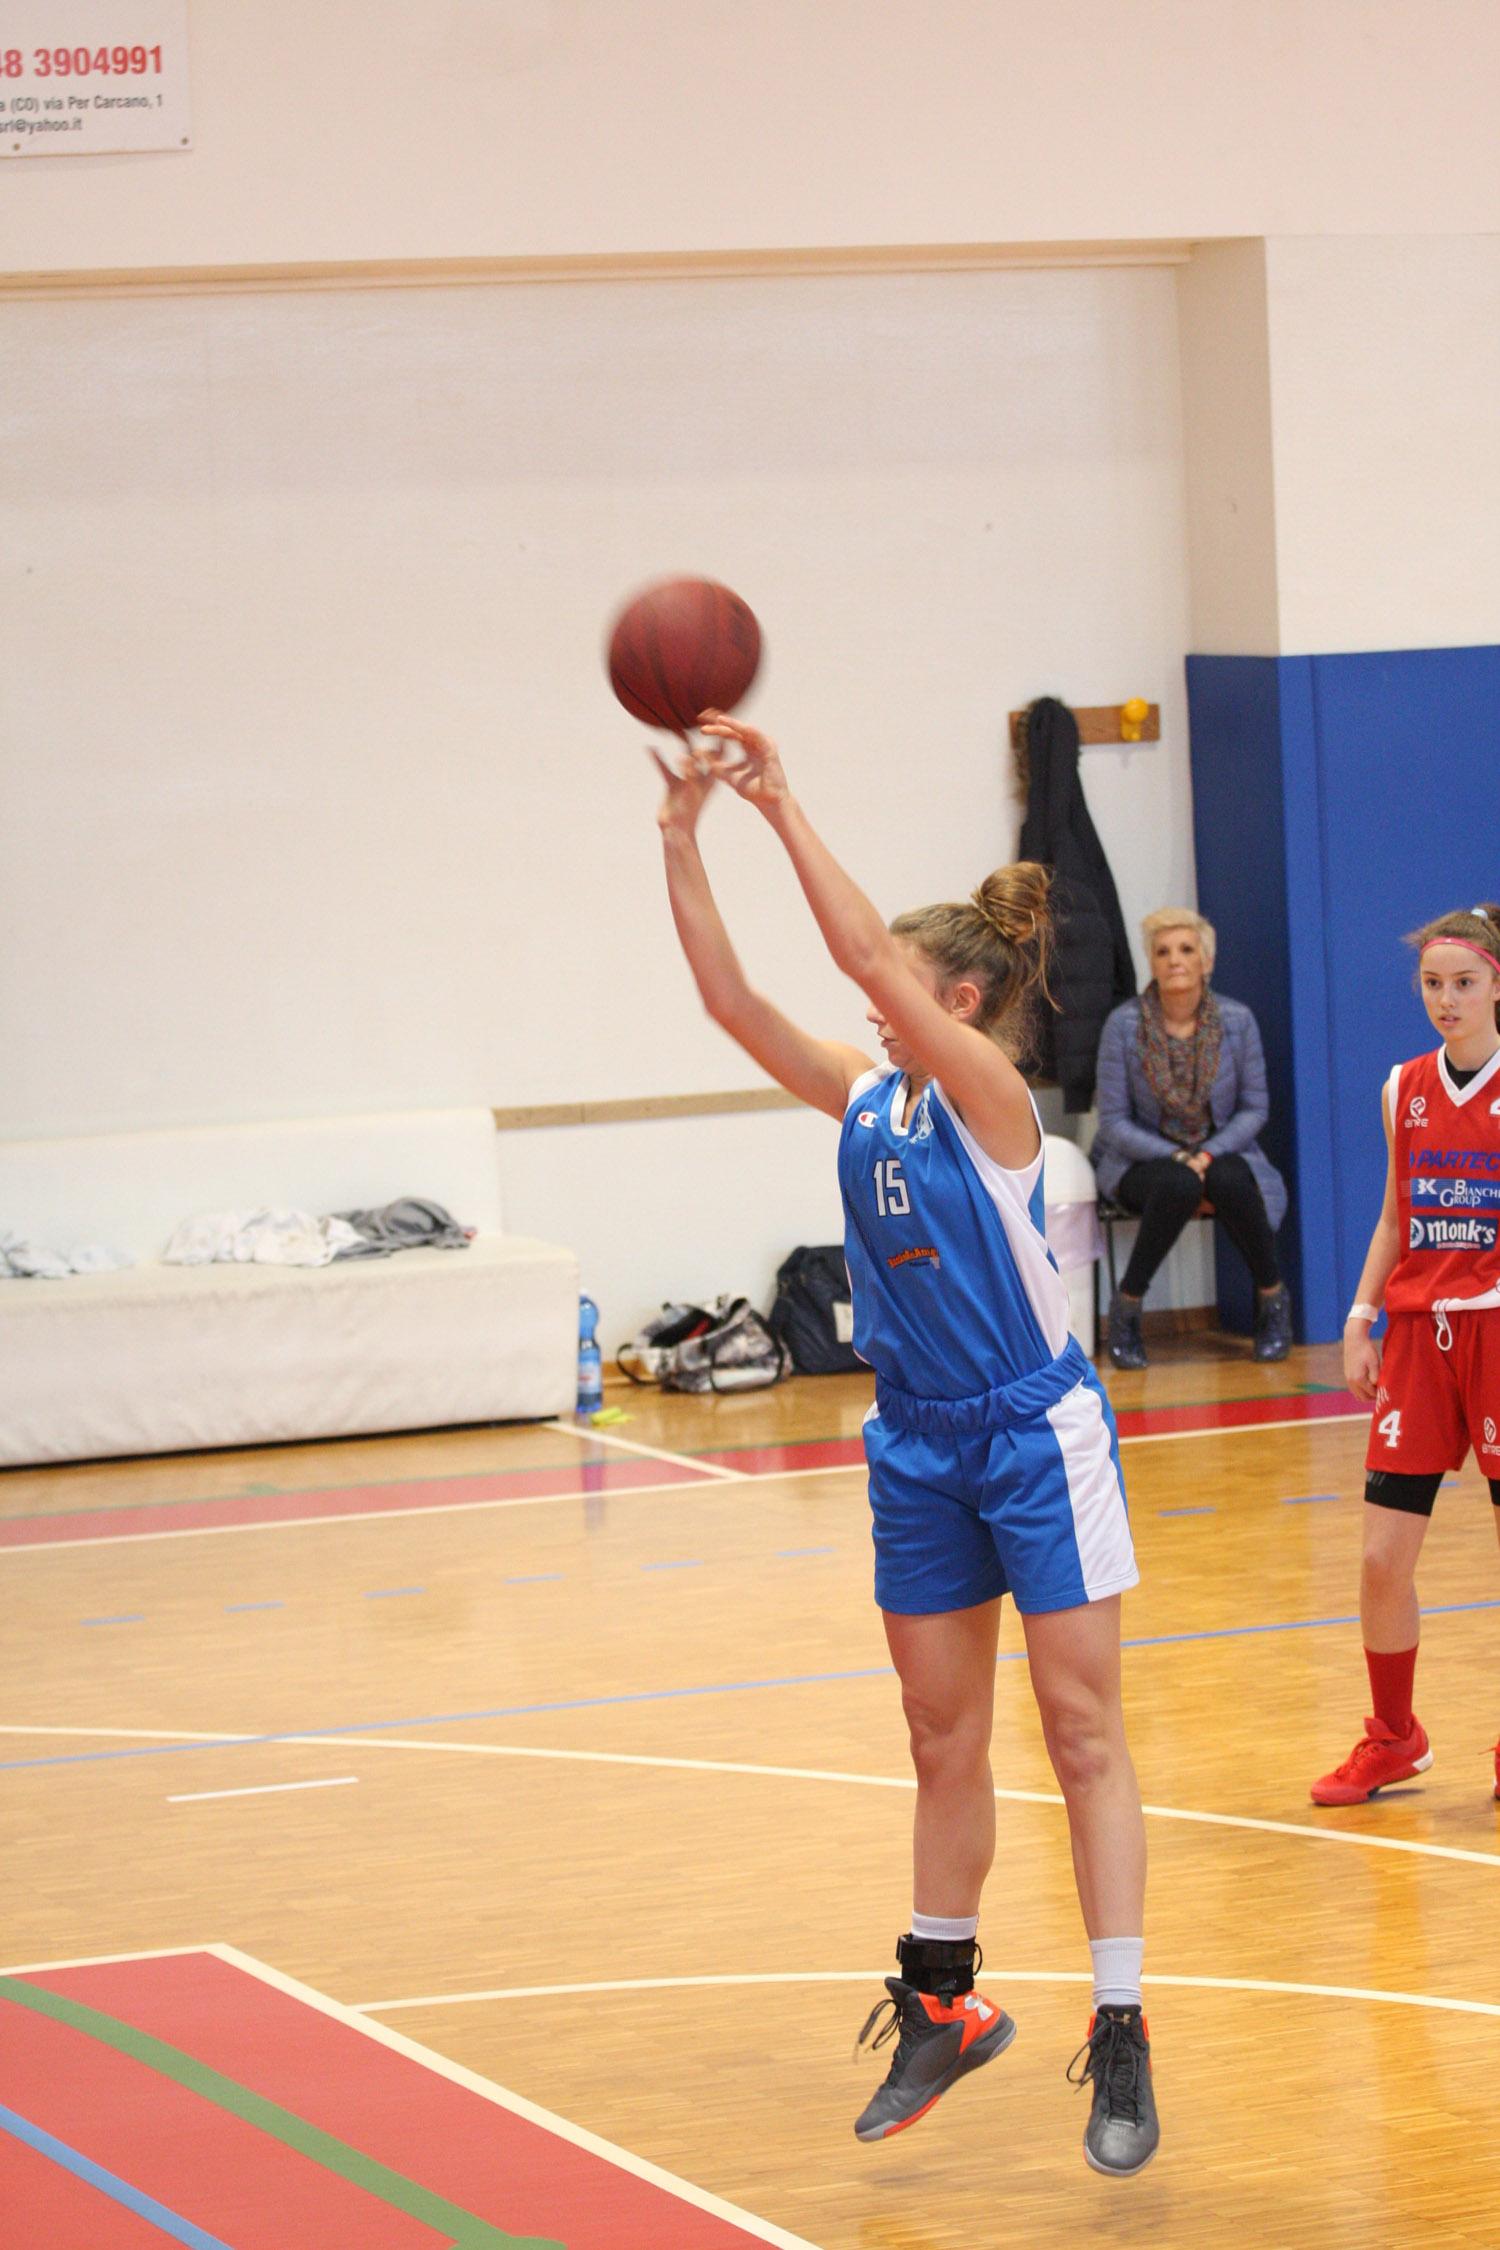 U16E - Costa Masnaga vs Baskettiamo Vittuone 2001 00019.jpg